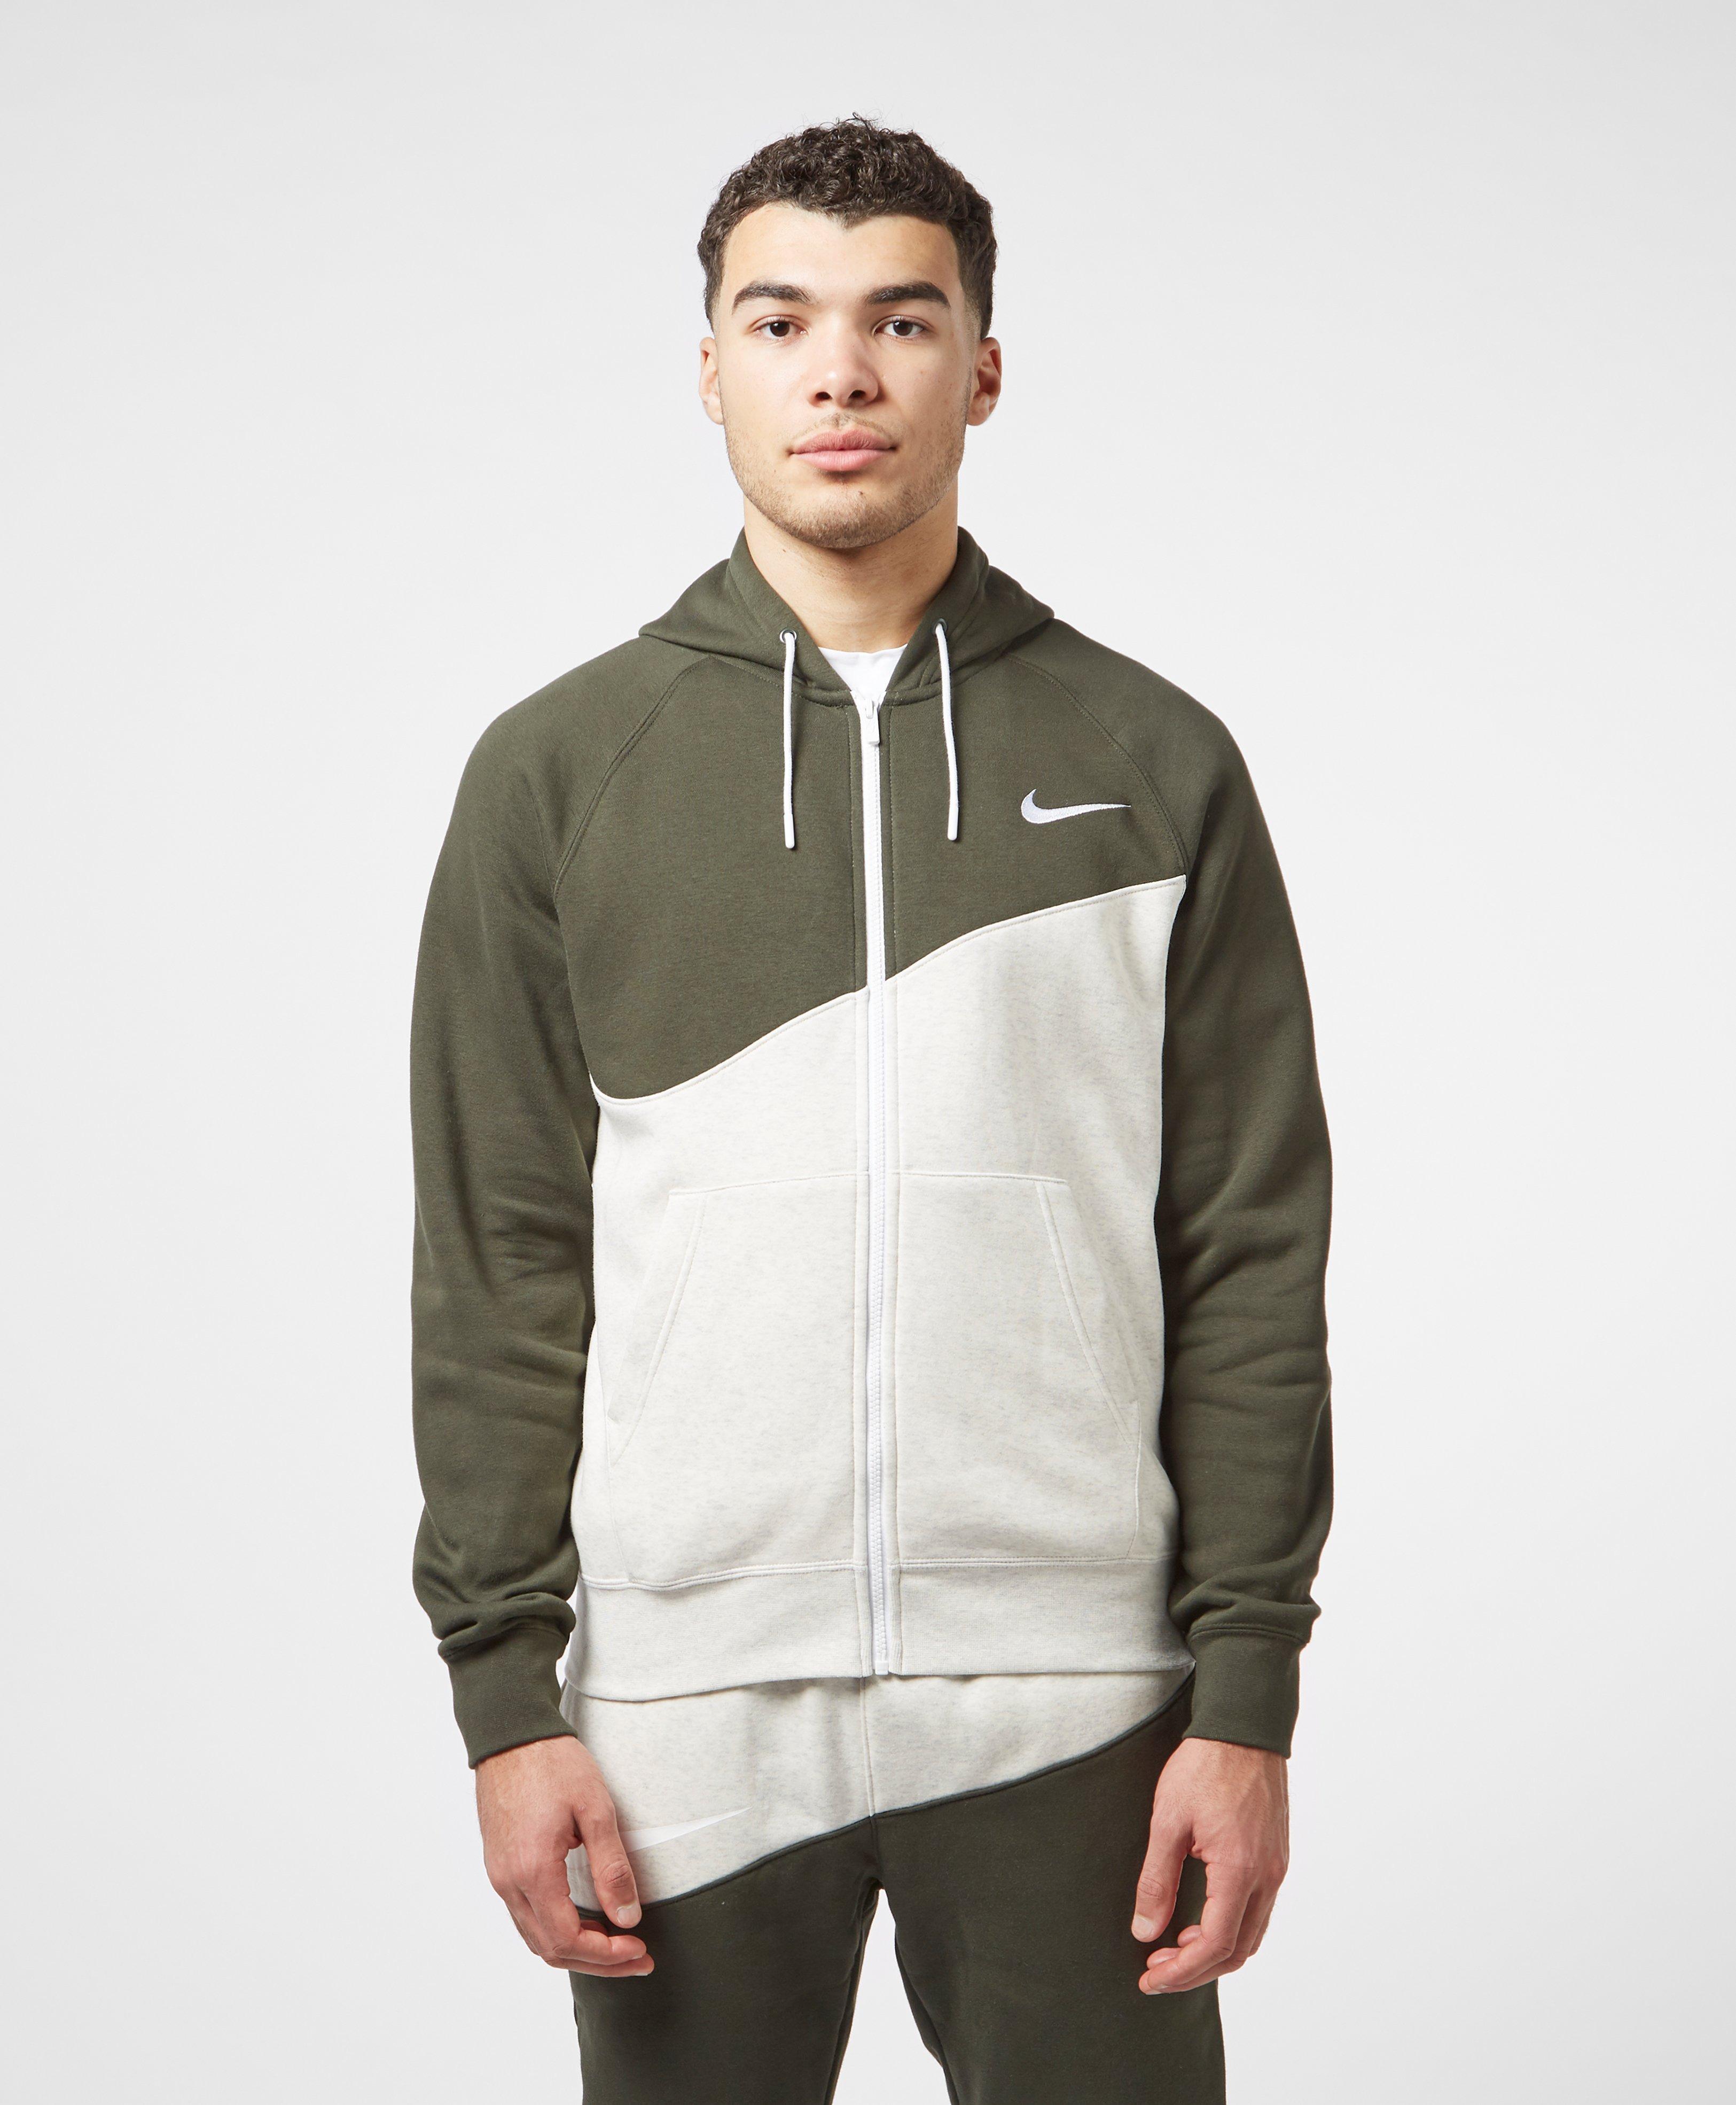 new styles super quality store Nike Swoosh Fleece Full Zip Hoodie | scotts Menswear